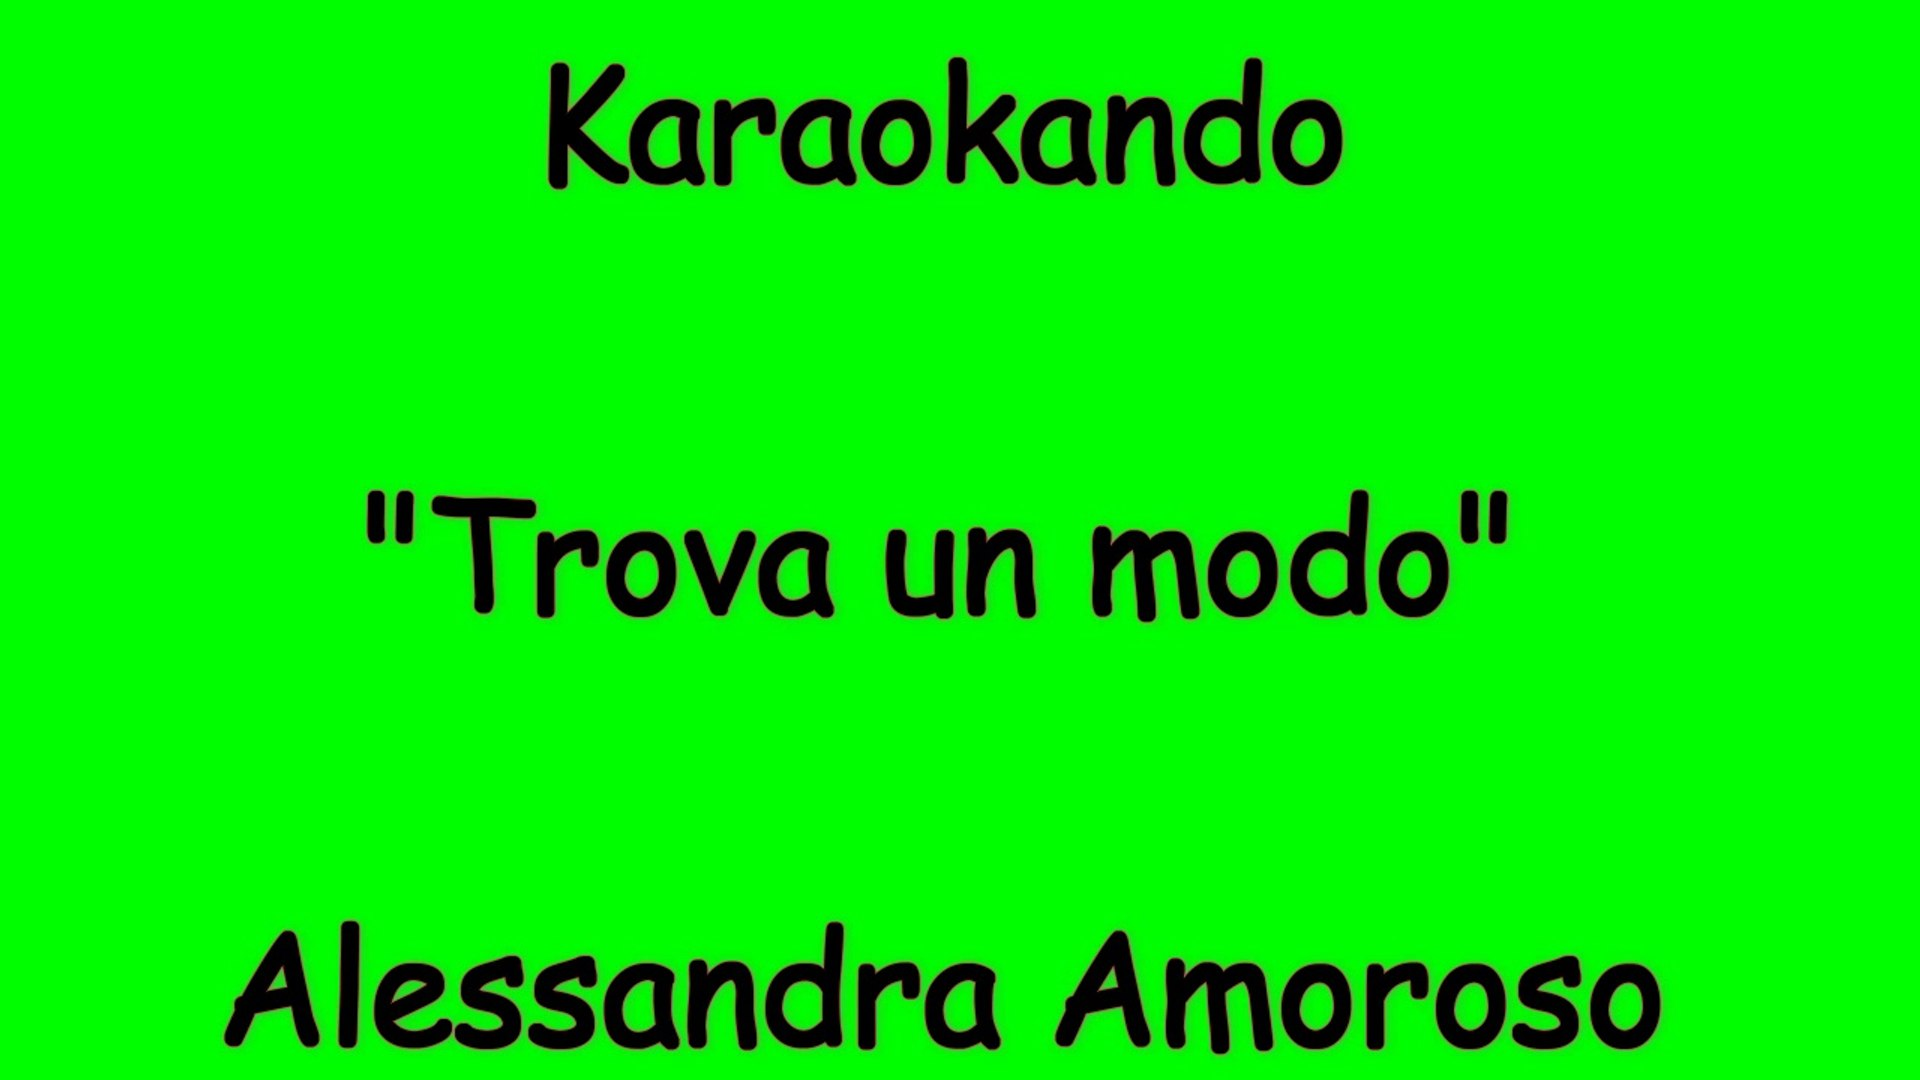 Karaoke Italiano - Trova un modo - Alessandra Amoroso ( Testo ) - Video  Dailymotion